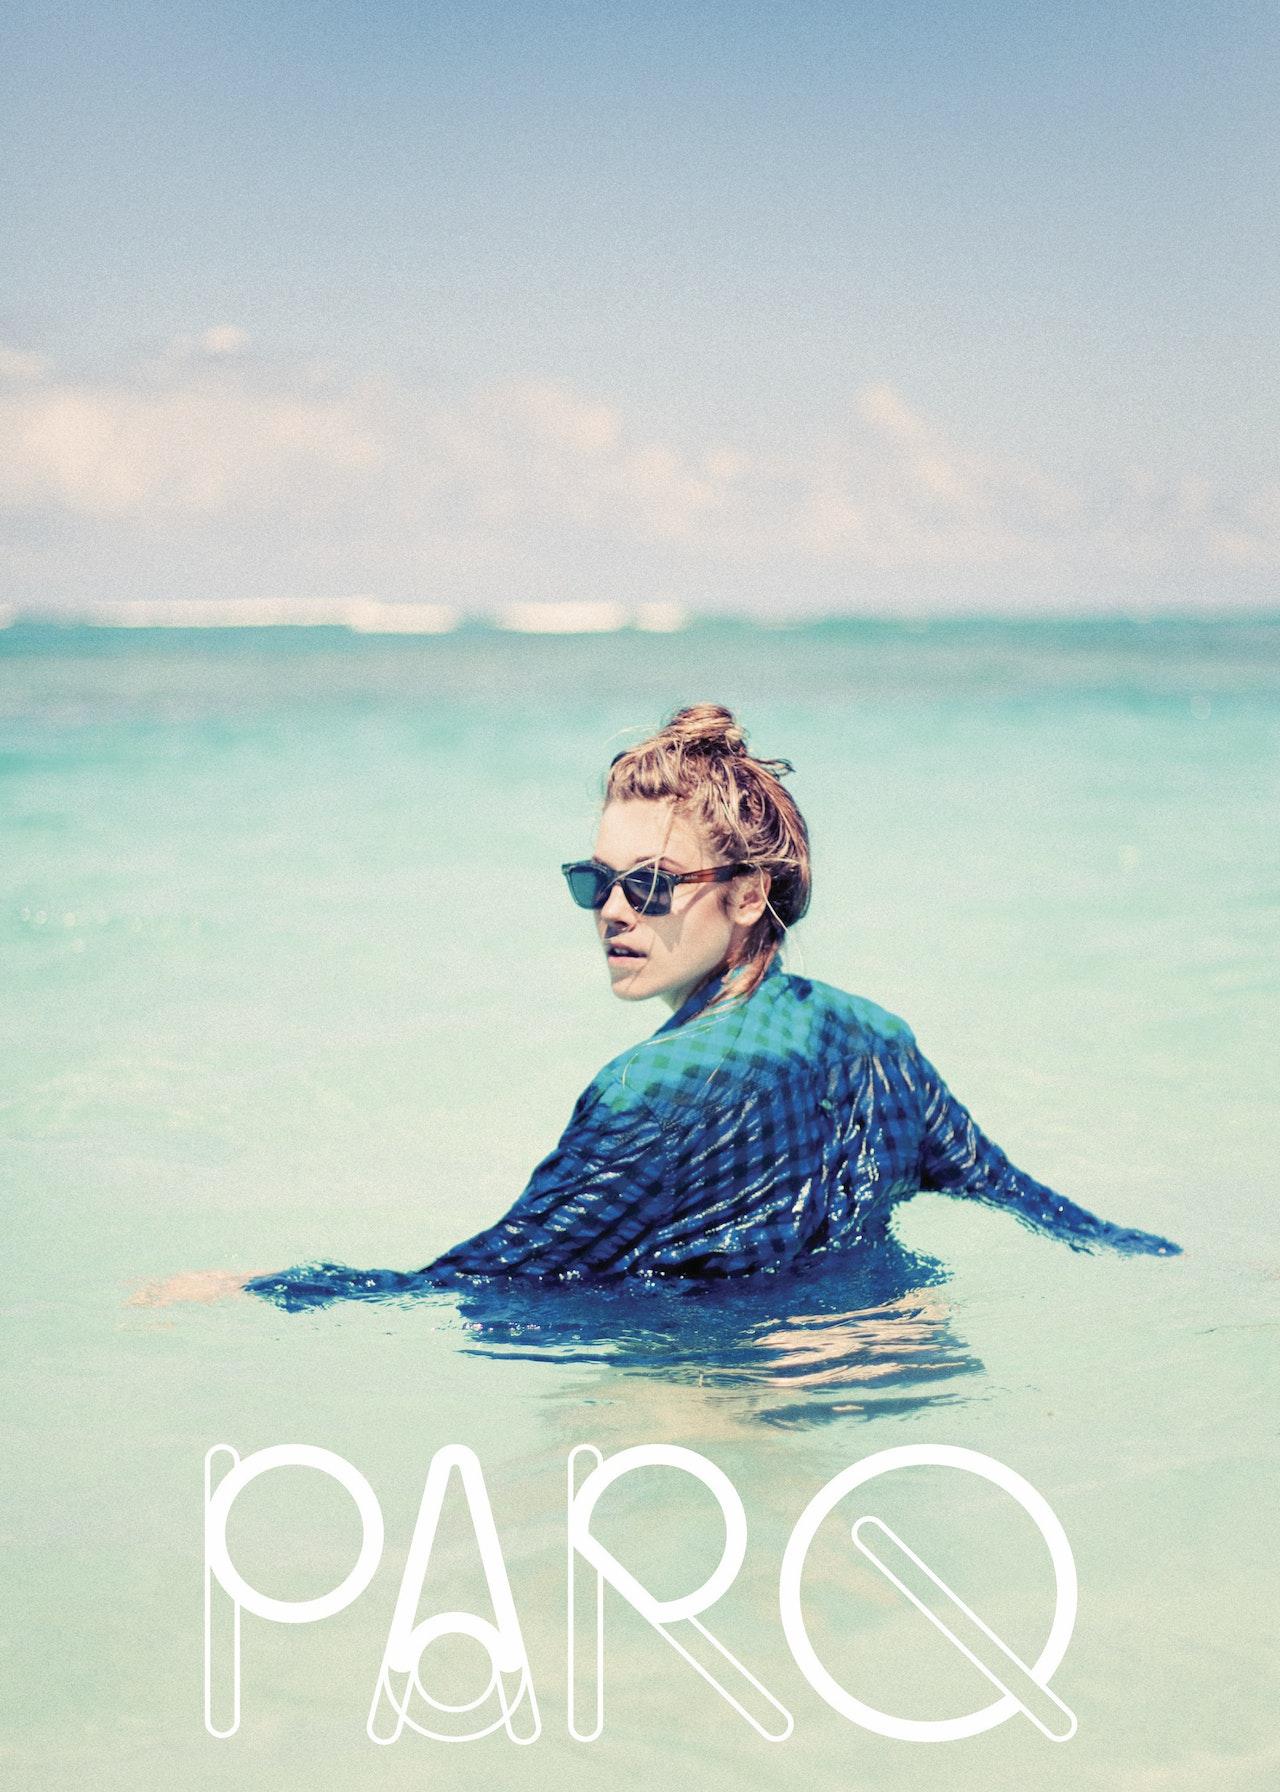 'Summer' - Parq Mag